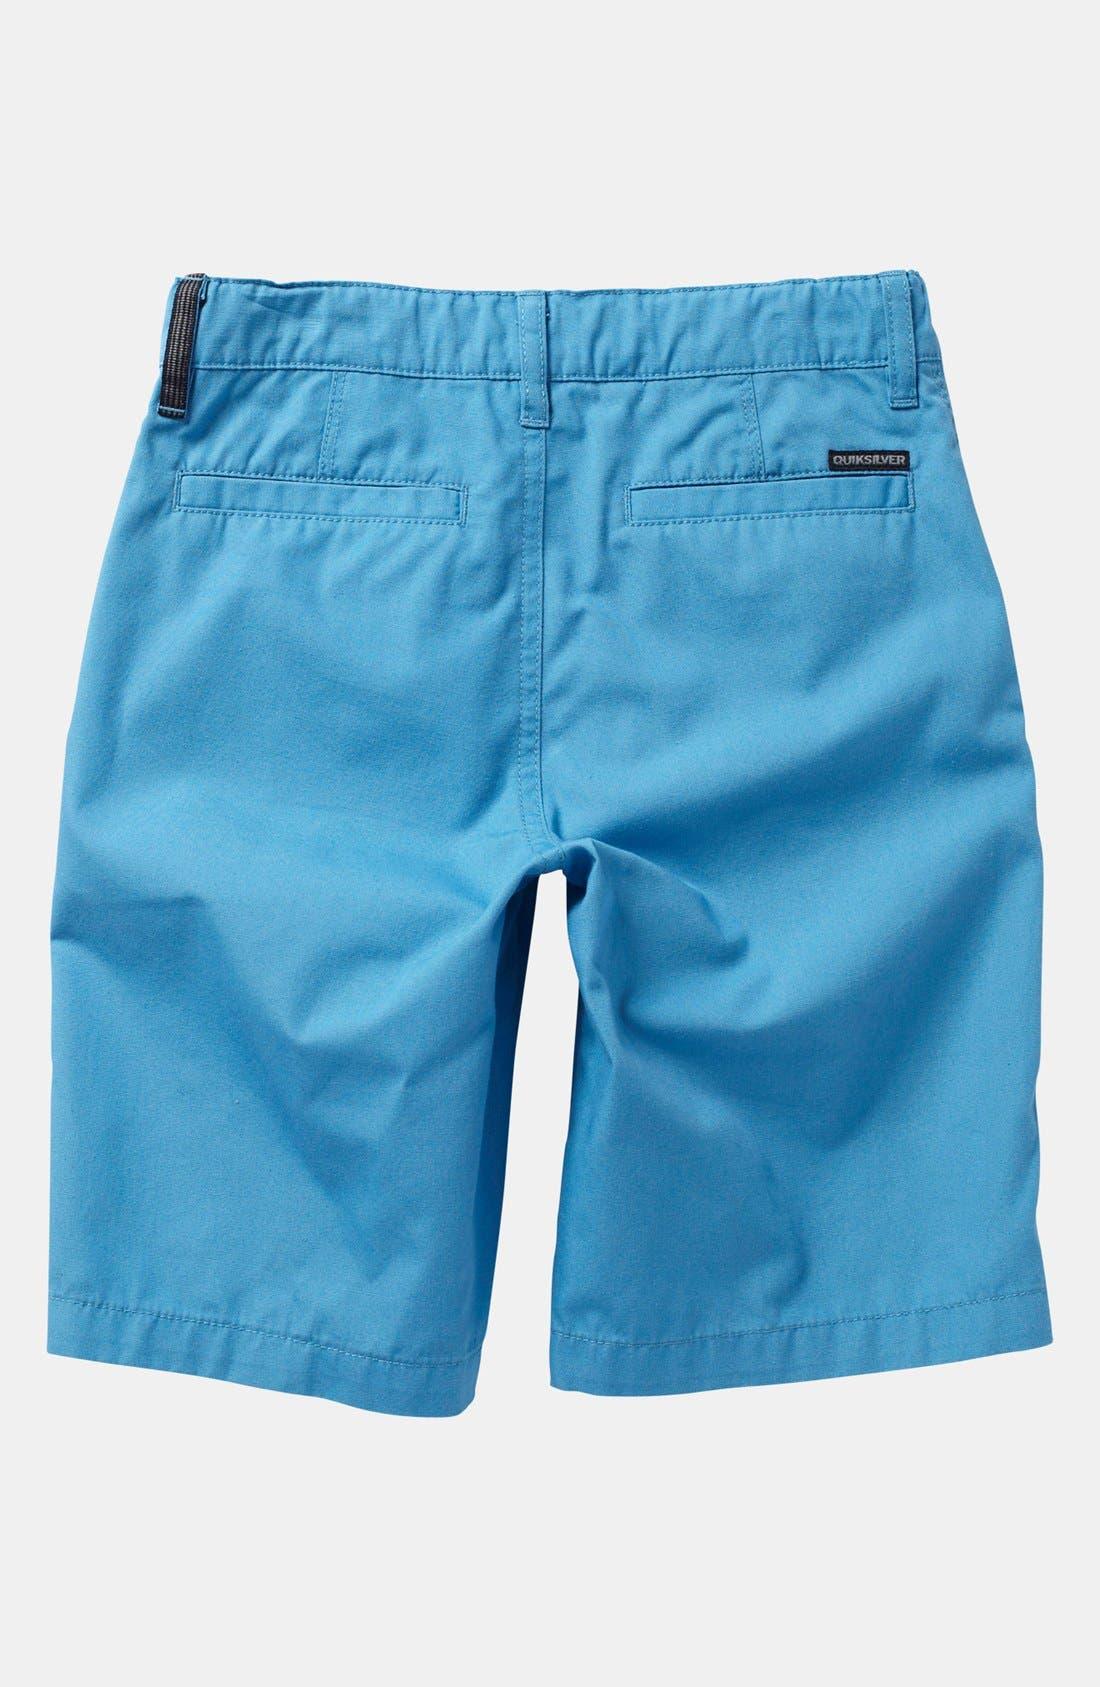 Alternate Image 2  - Quiksilver 'Rockford' Shorts (Baby)